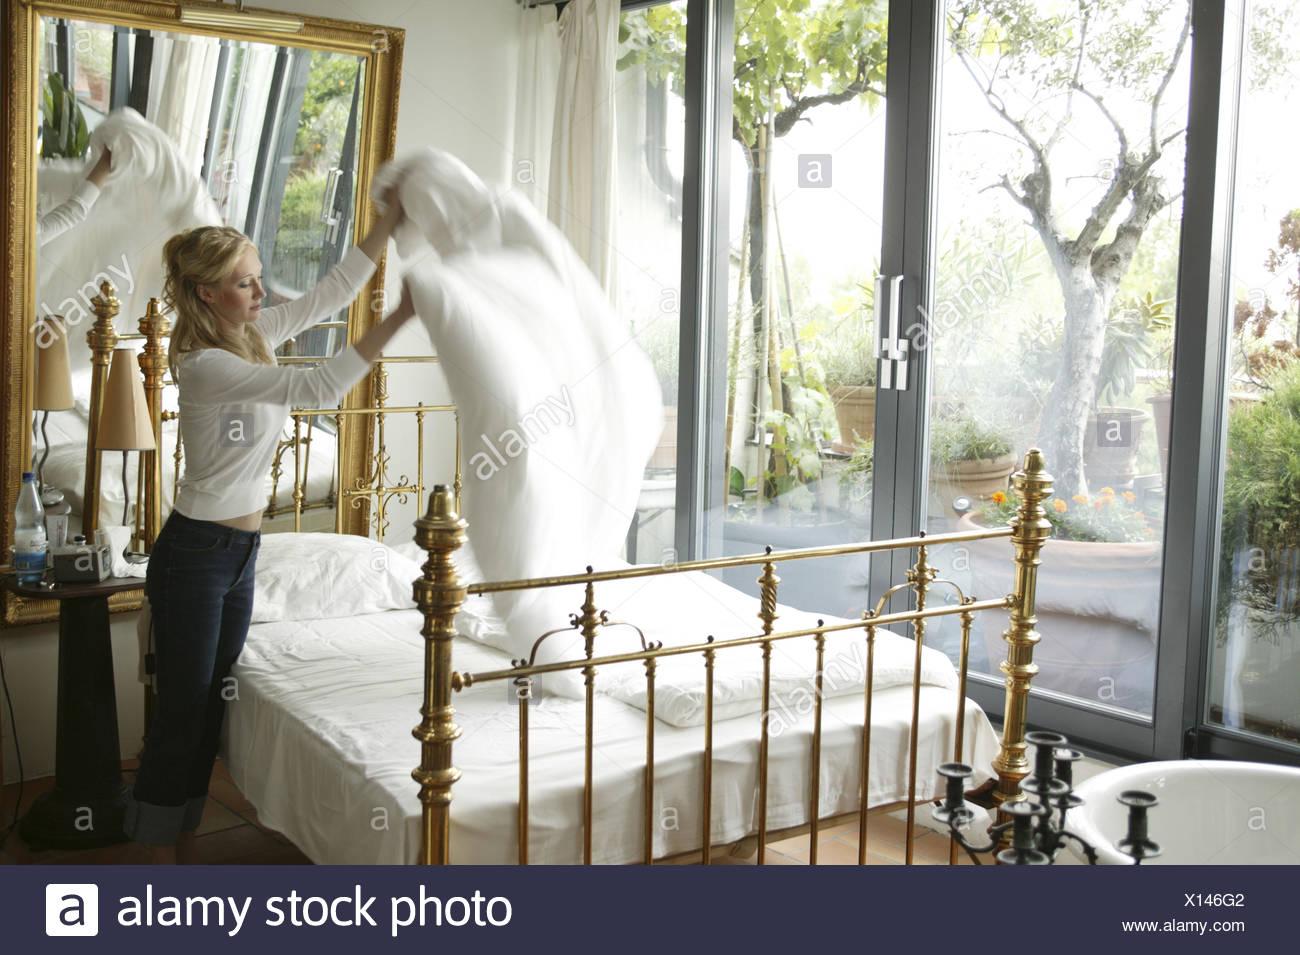 Brass Bed Stockfotos & Brass Bed Bilder - Alamy